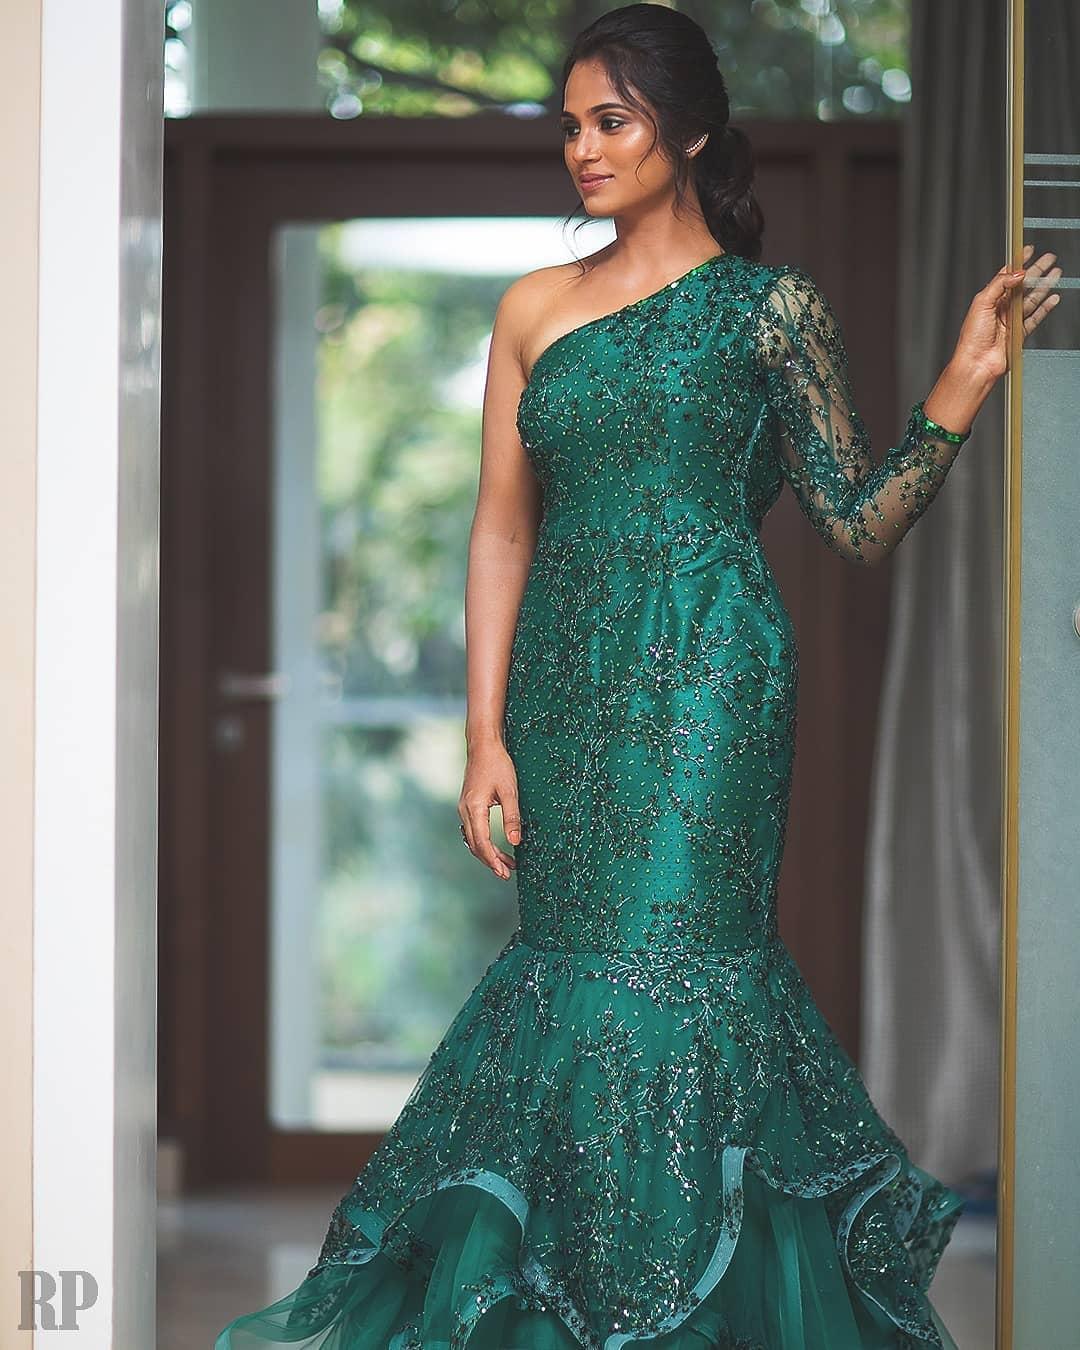 South Indian Actress Ramya Pandian Looking Hot in Green Dress